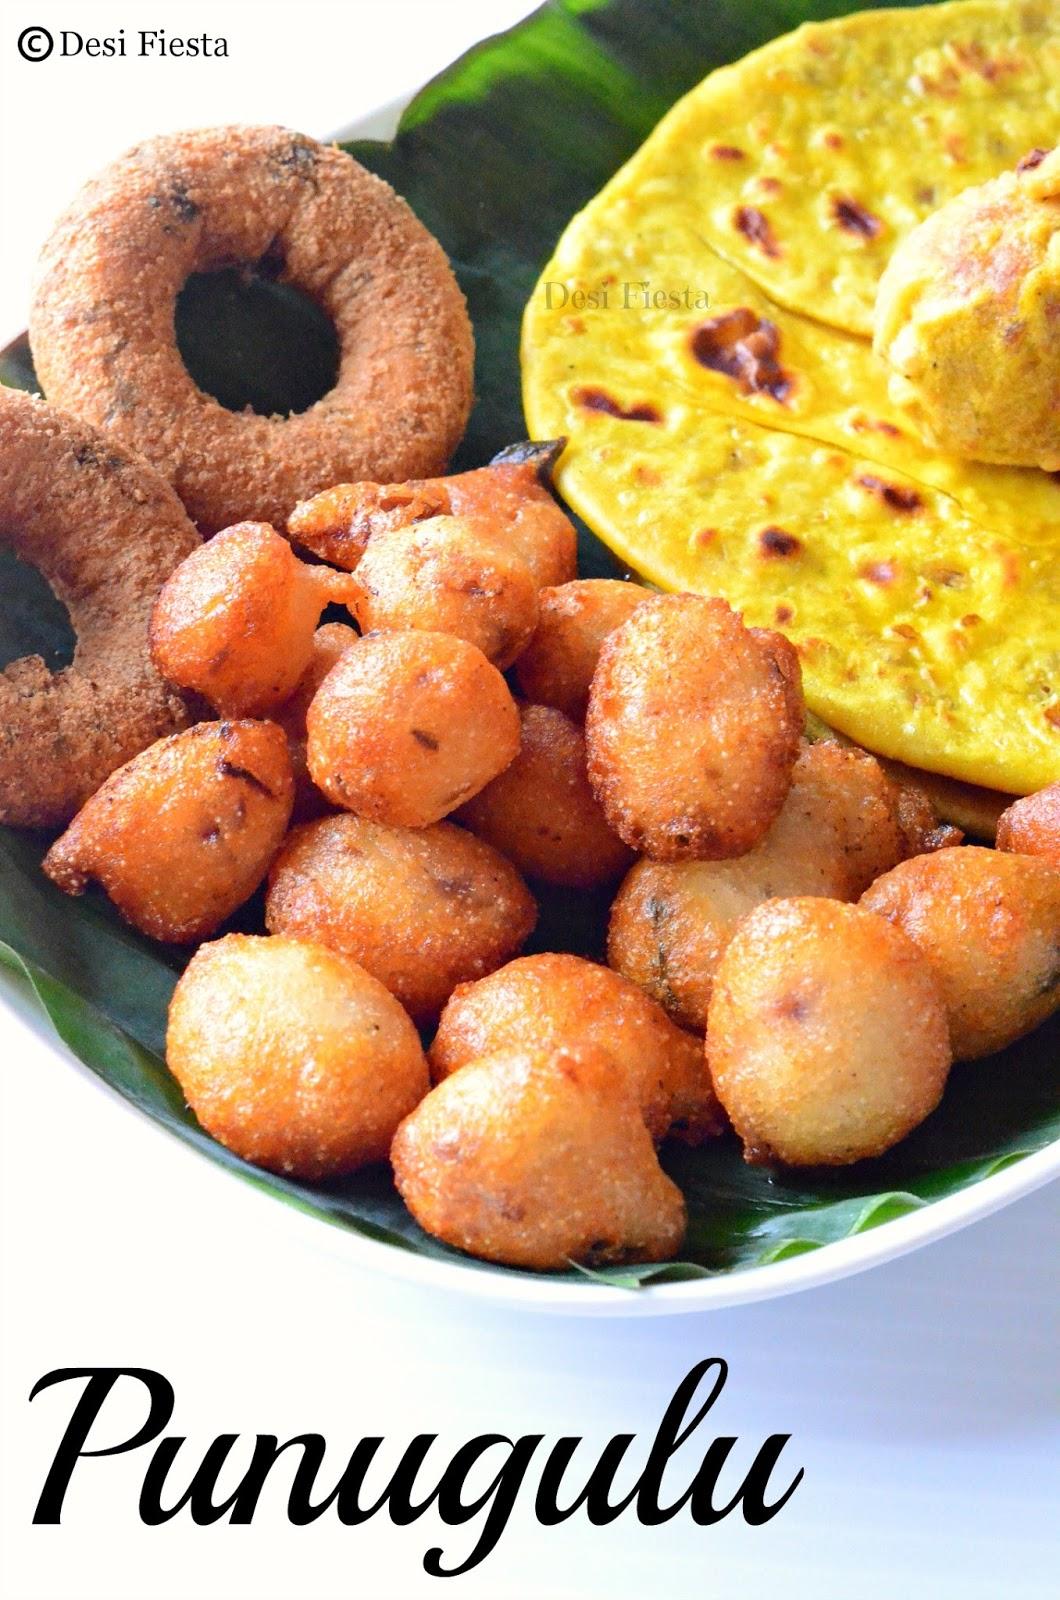 Desi fiesta andhra pradesh ugadi meals adhra pradesh thali for Andhra pradesh cuisine